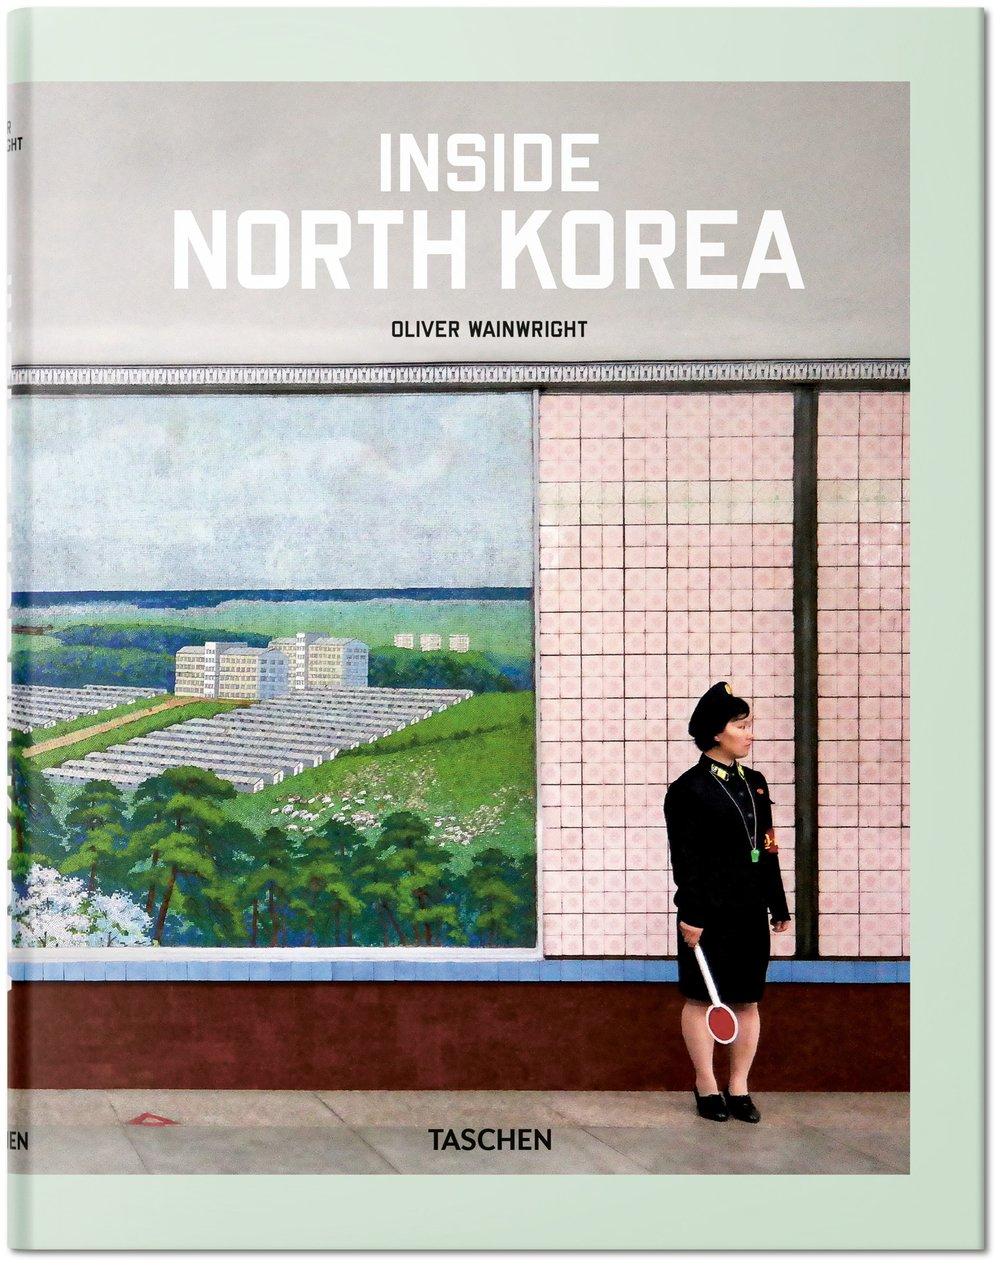 INSIDE_NORTH_KOREA_FO_INT_3D_05337-min.jpg